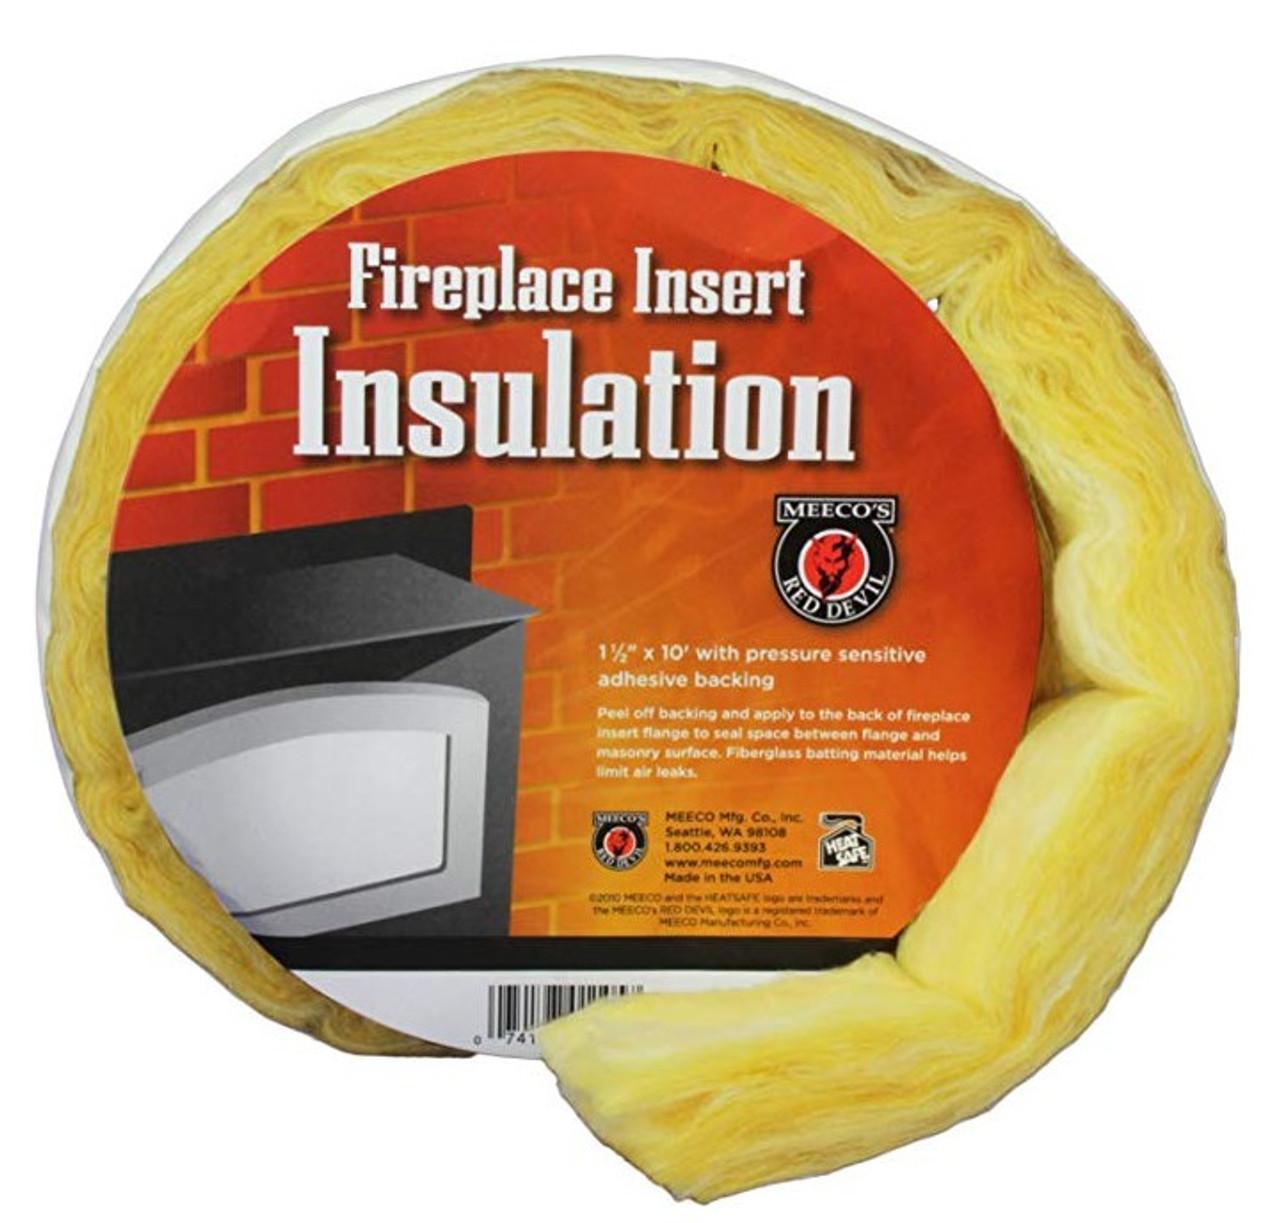 Fireplace Insert Surround Insulation